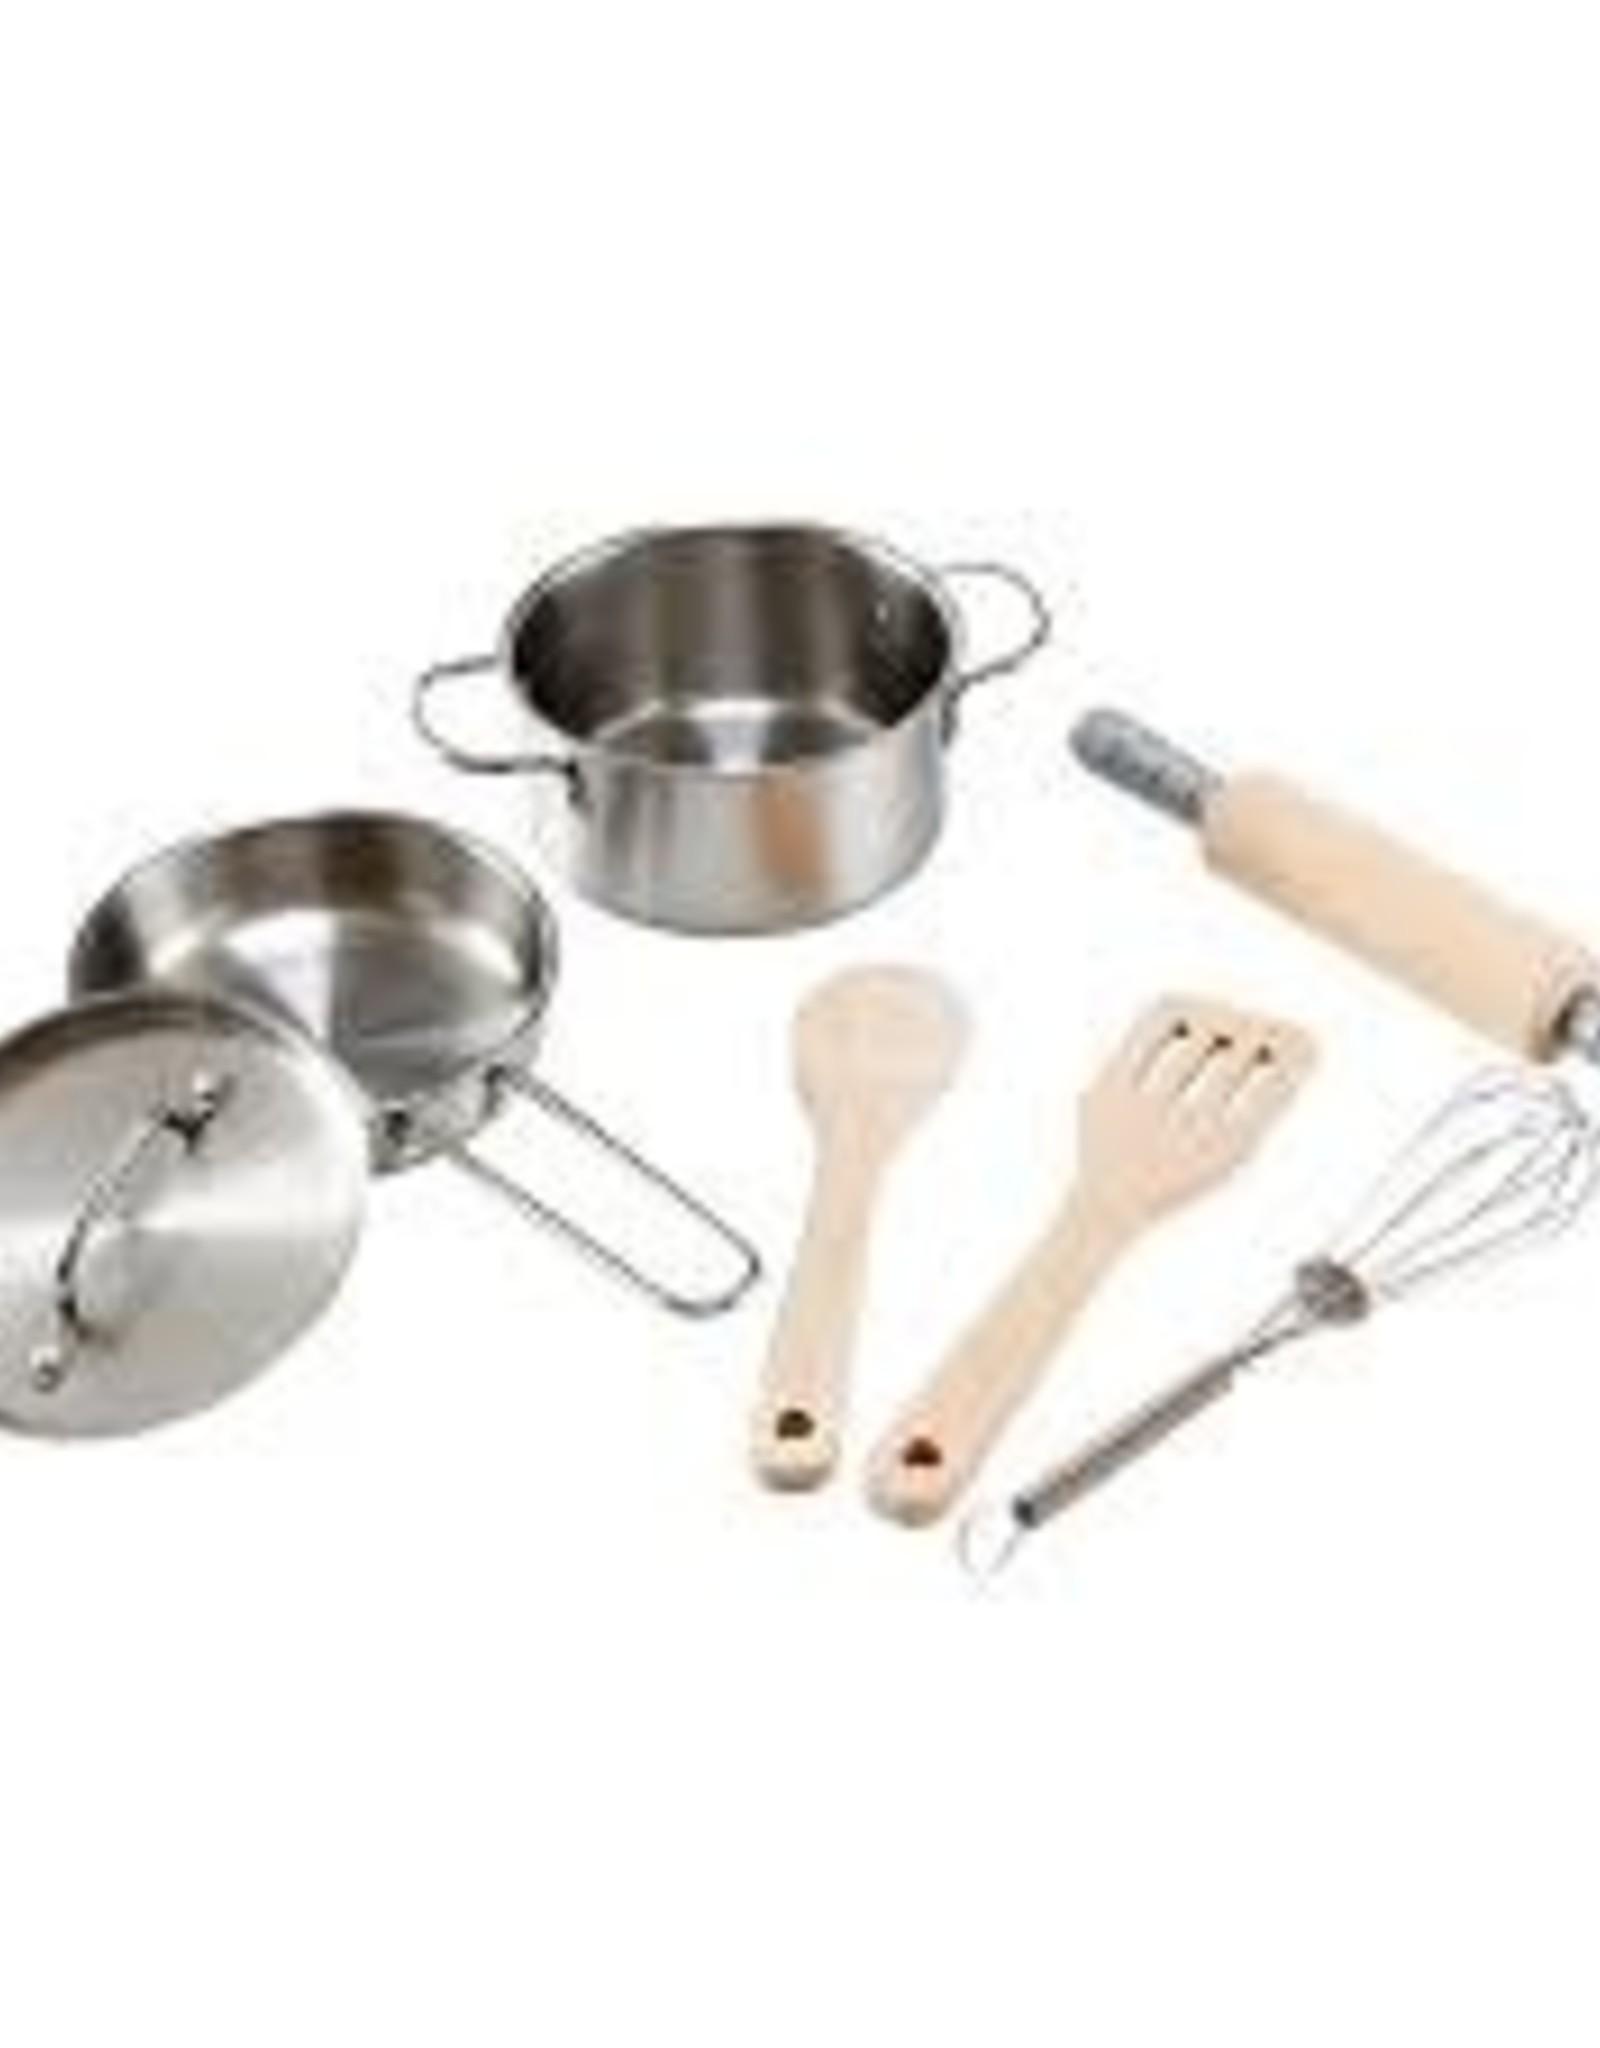 Hape Chef's Cooking Set